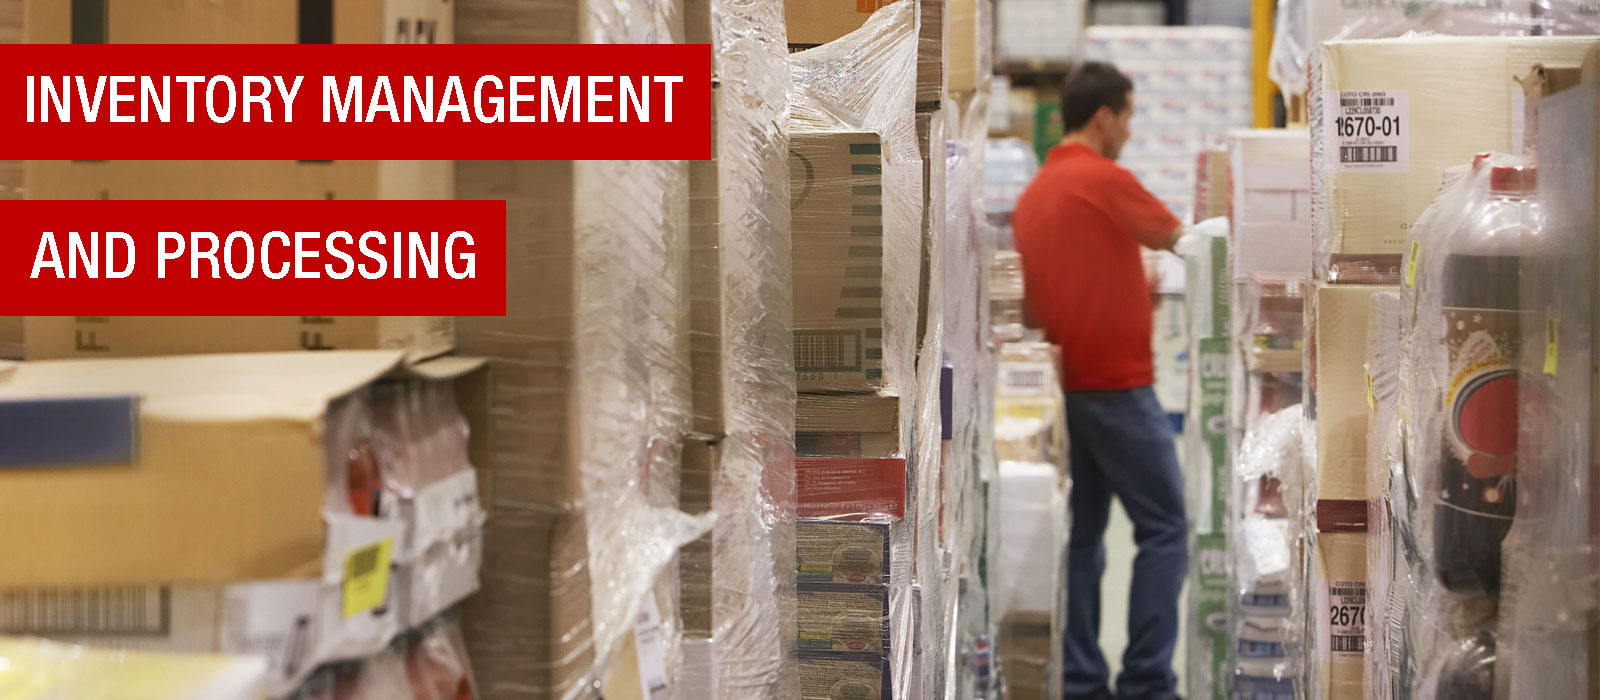 inventory-management-processing-slider.jpg